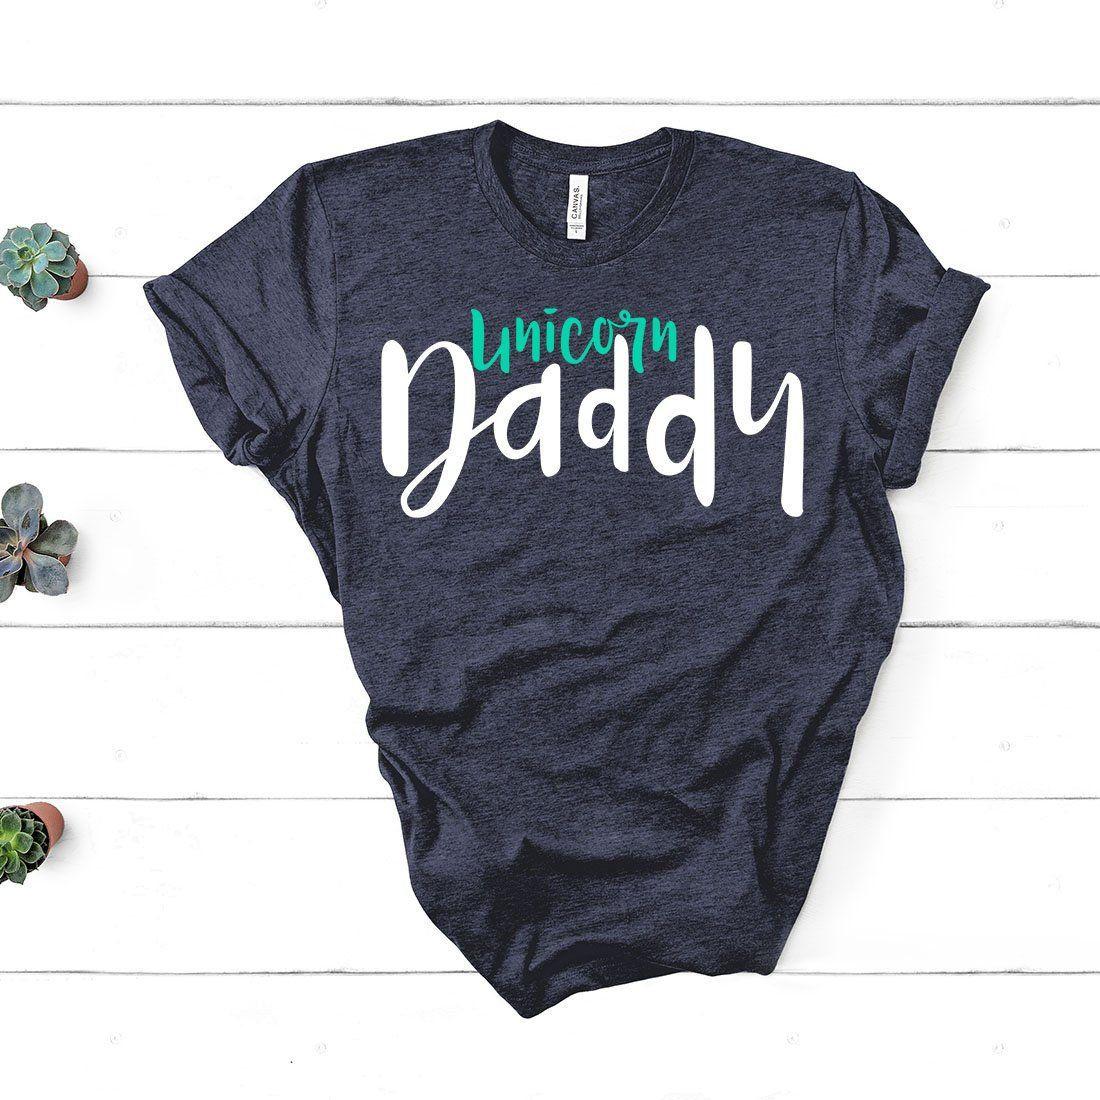 fc7b7b0b0 Unicorn Daddy Shirt - Unicorn Shirt - Unicorn Gift - Unicorn Party - Unicorn  Lovers - Funny New Dad - Father's Day - Unisex Graphic Tee